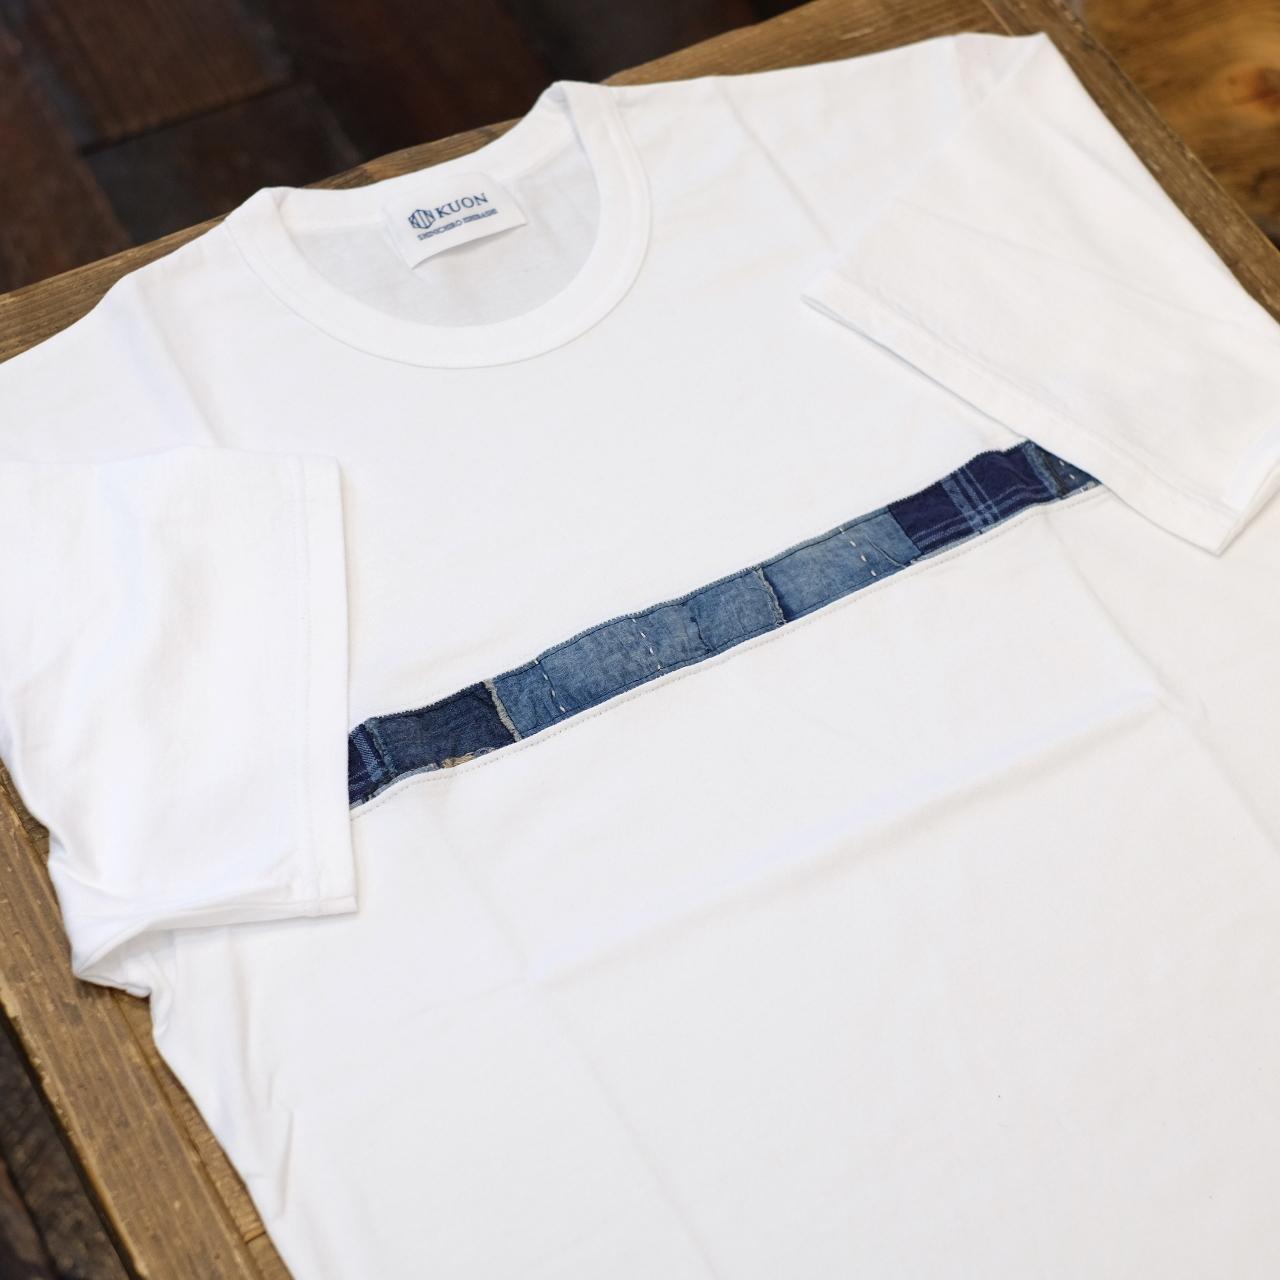 KUON(クオン) アップサイクル襤褸 トリミングTシャツ ホワイト